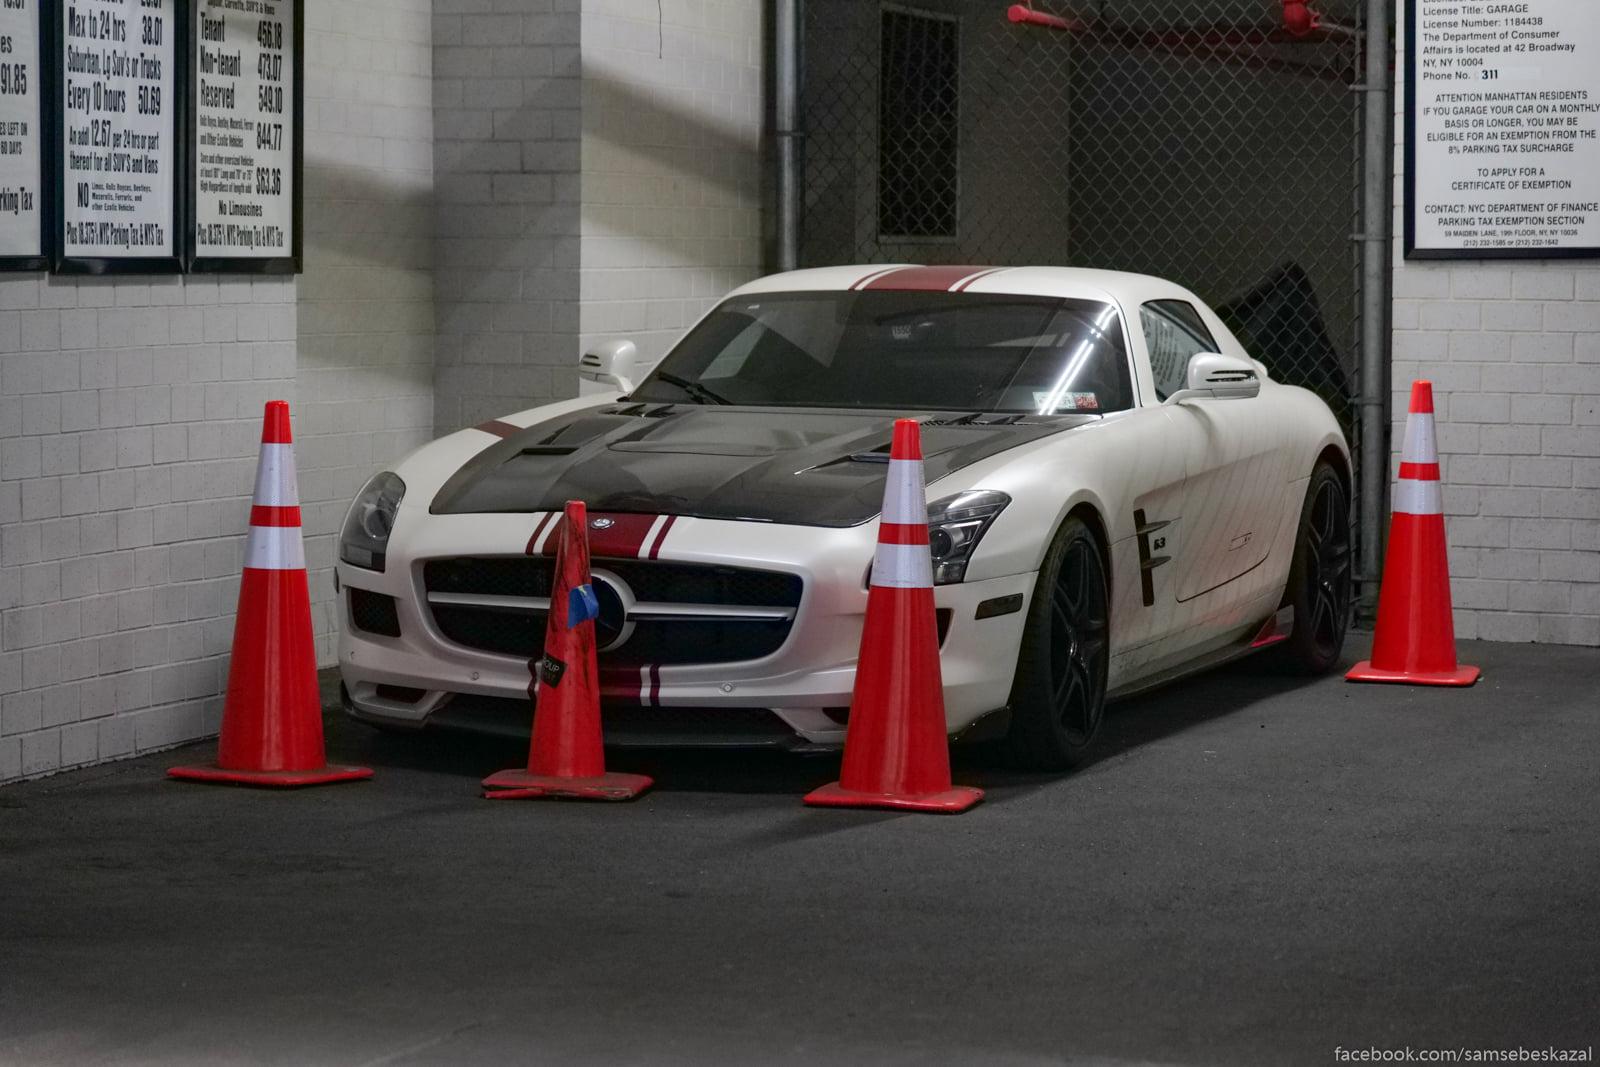 Kogda bois'sa parkovat'...